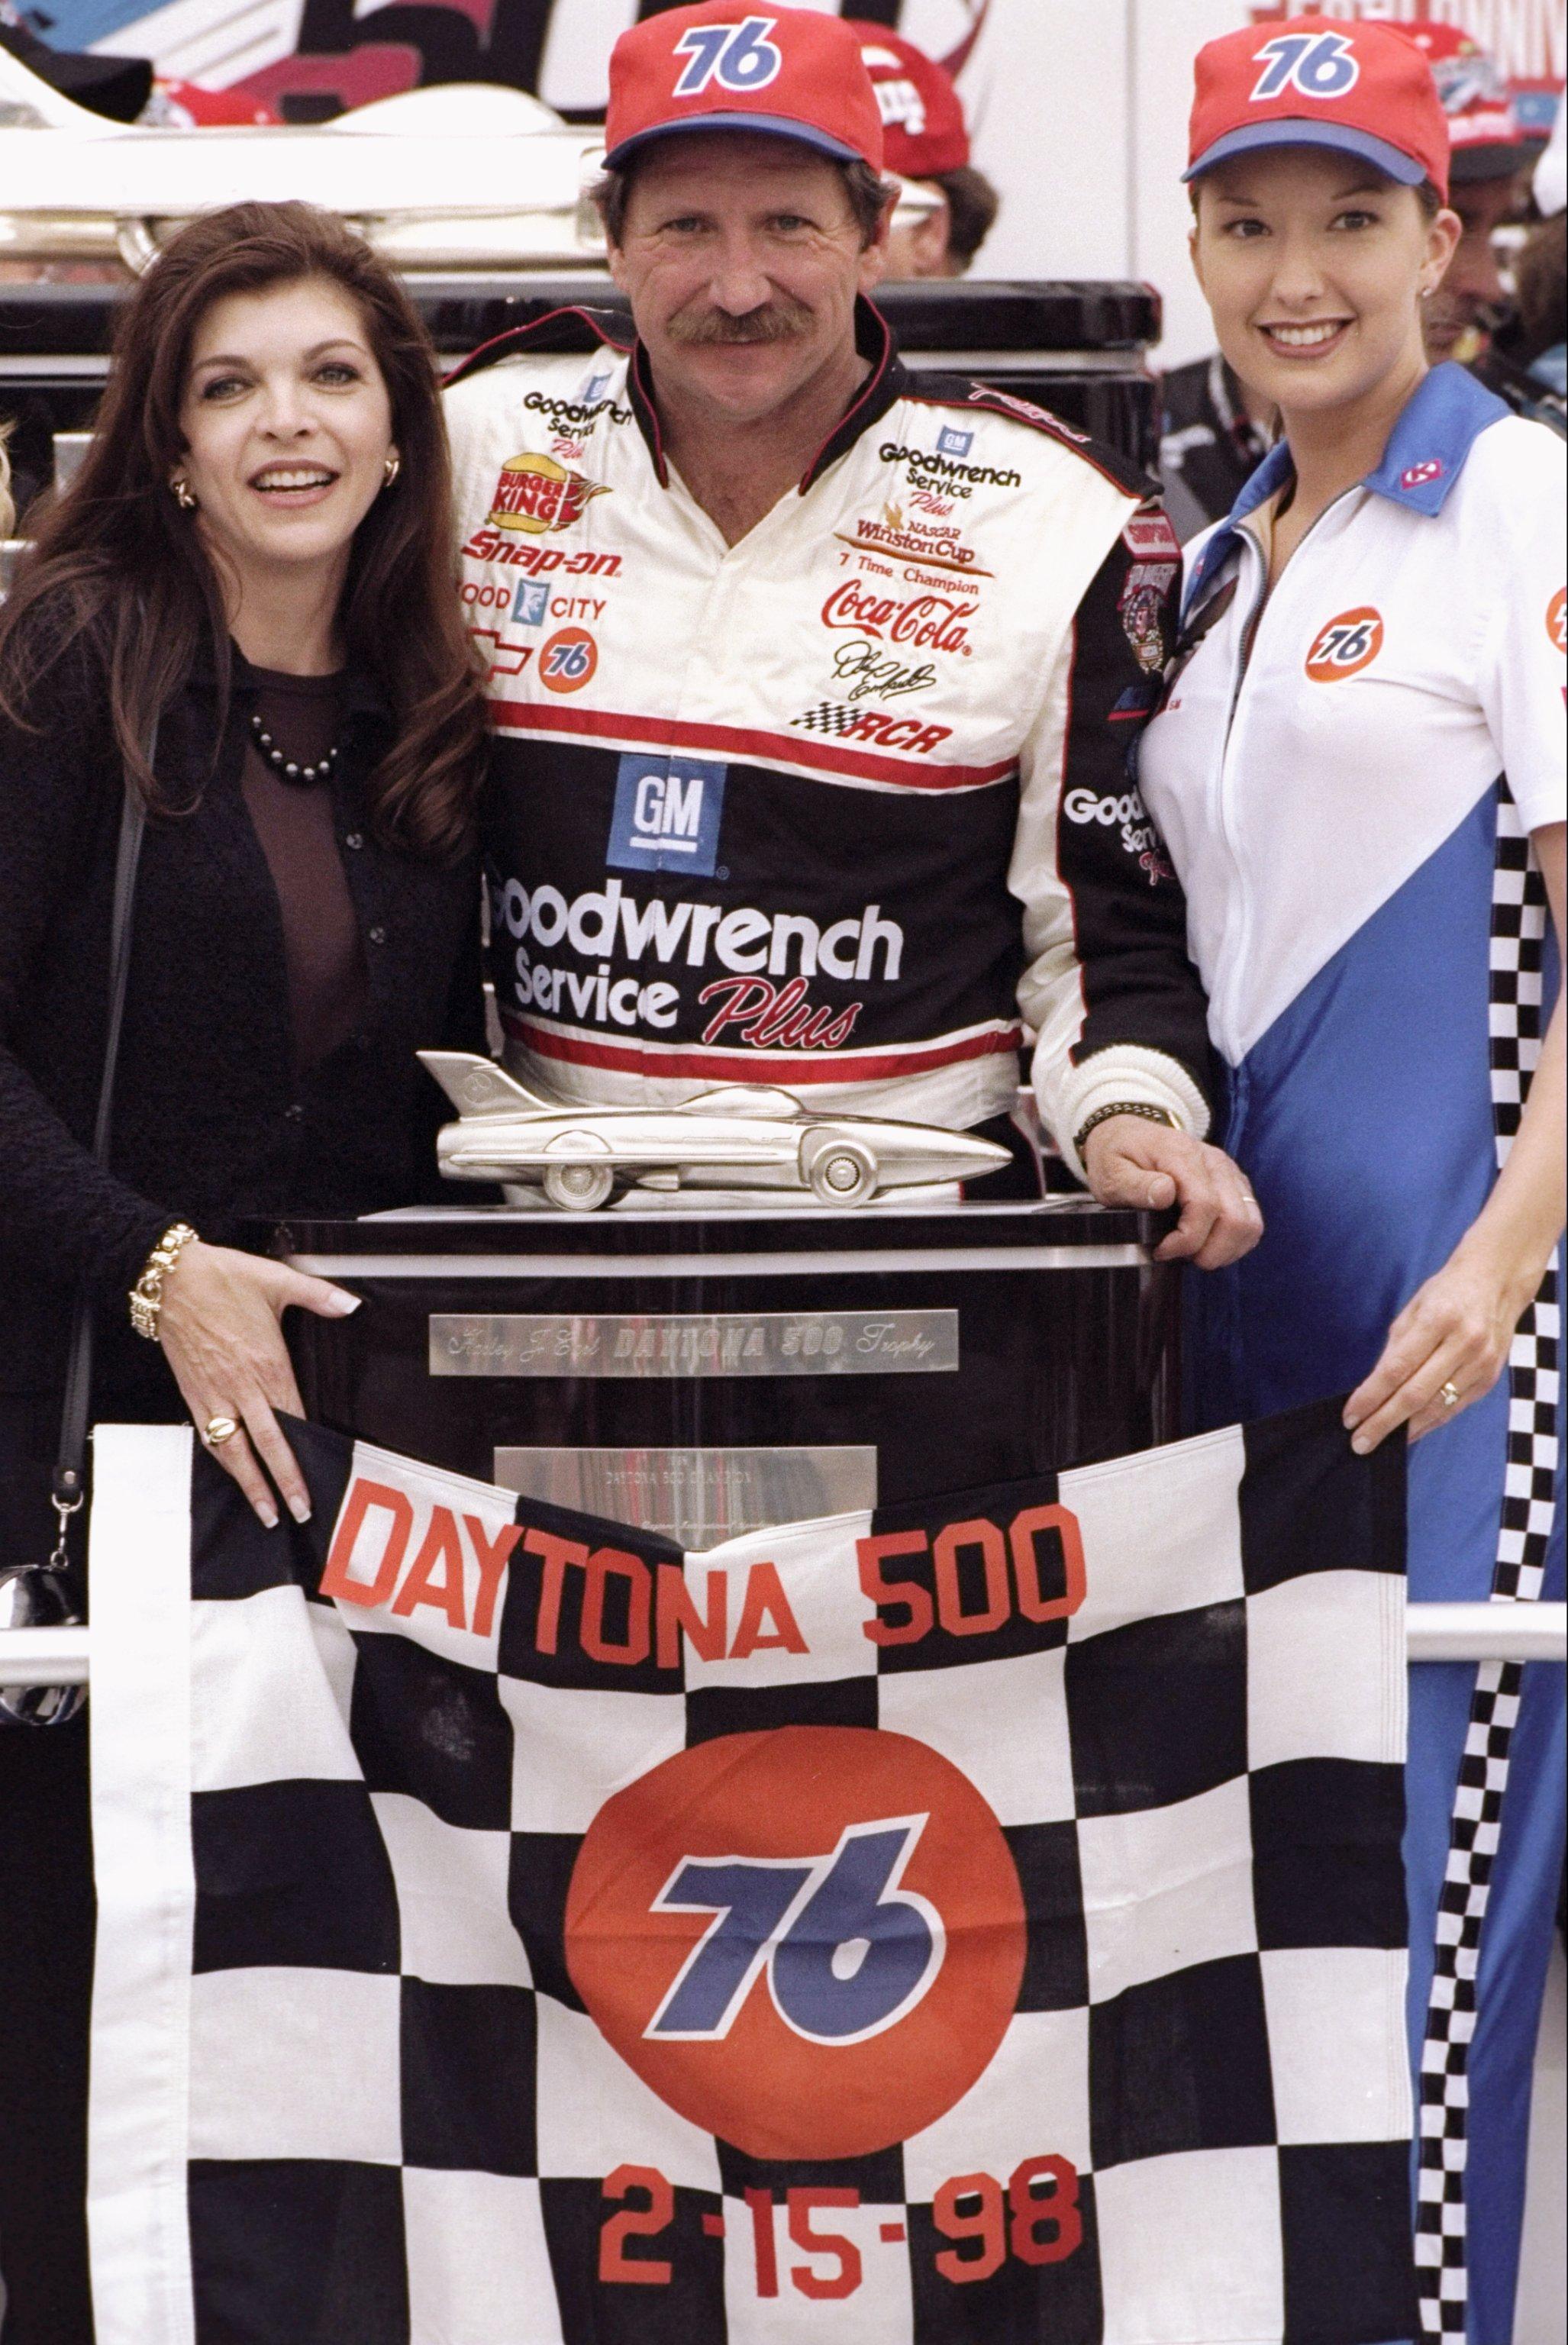 DAYTONA BEACH - FEBRUARY 15: Dale Earnhardt Sr. driver of the #3 GM Goodwrench Chevrolet celebrates with his wife Teresa after winning the Daytona 500 on February 15, 1998 at Daytona International Speedway in Daytona Beach, Florida. (Photo by David Taylor